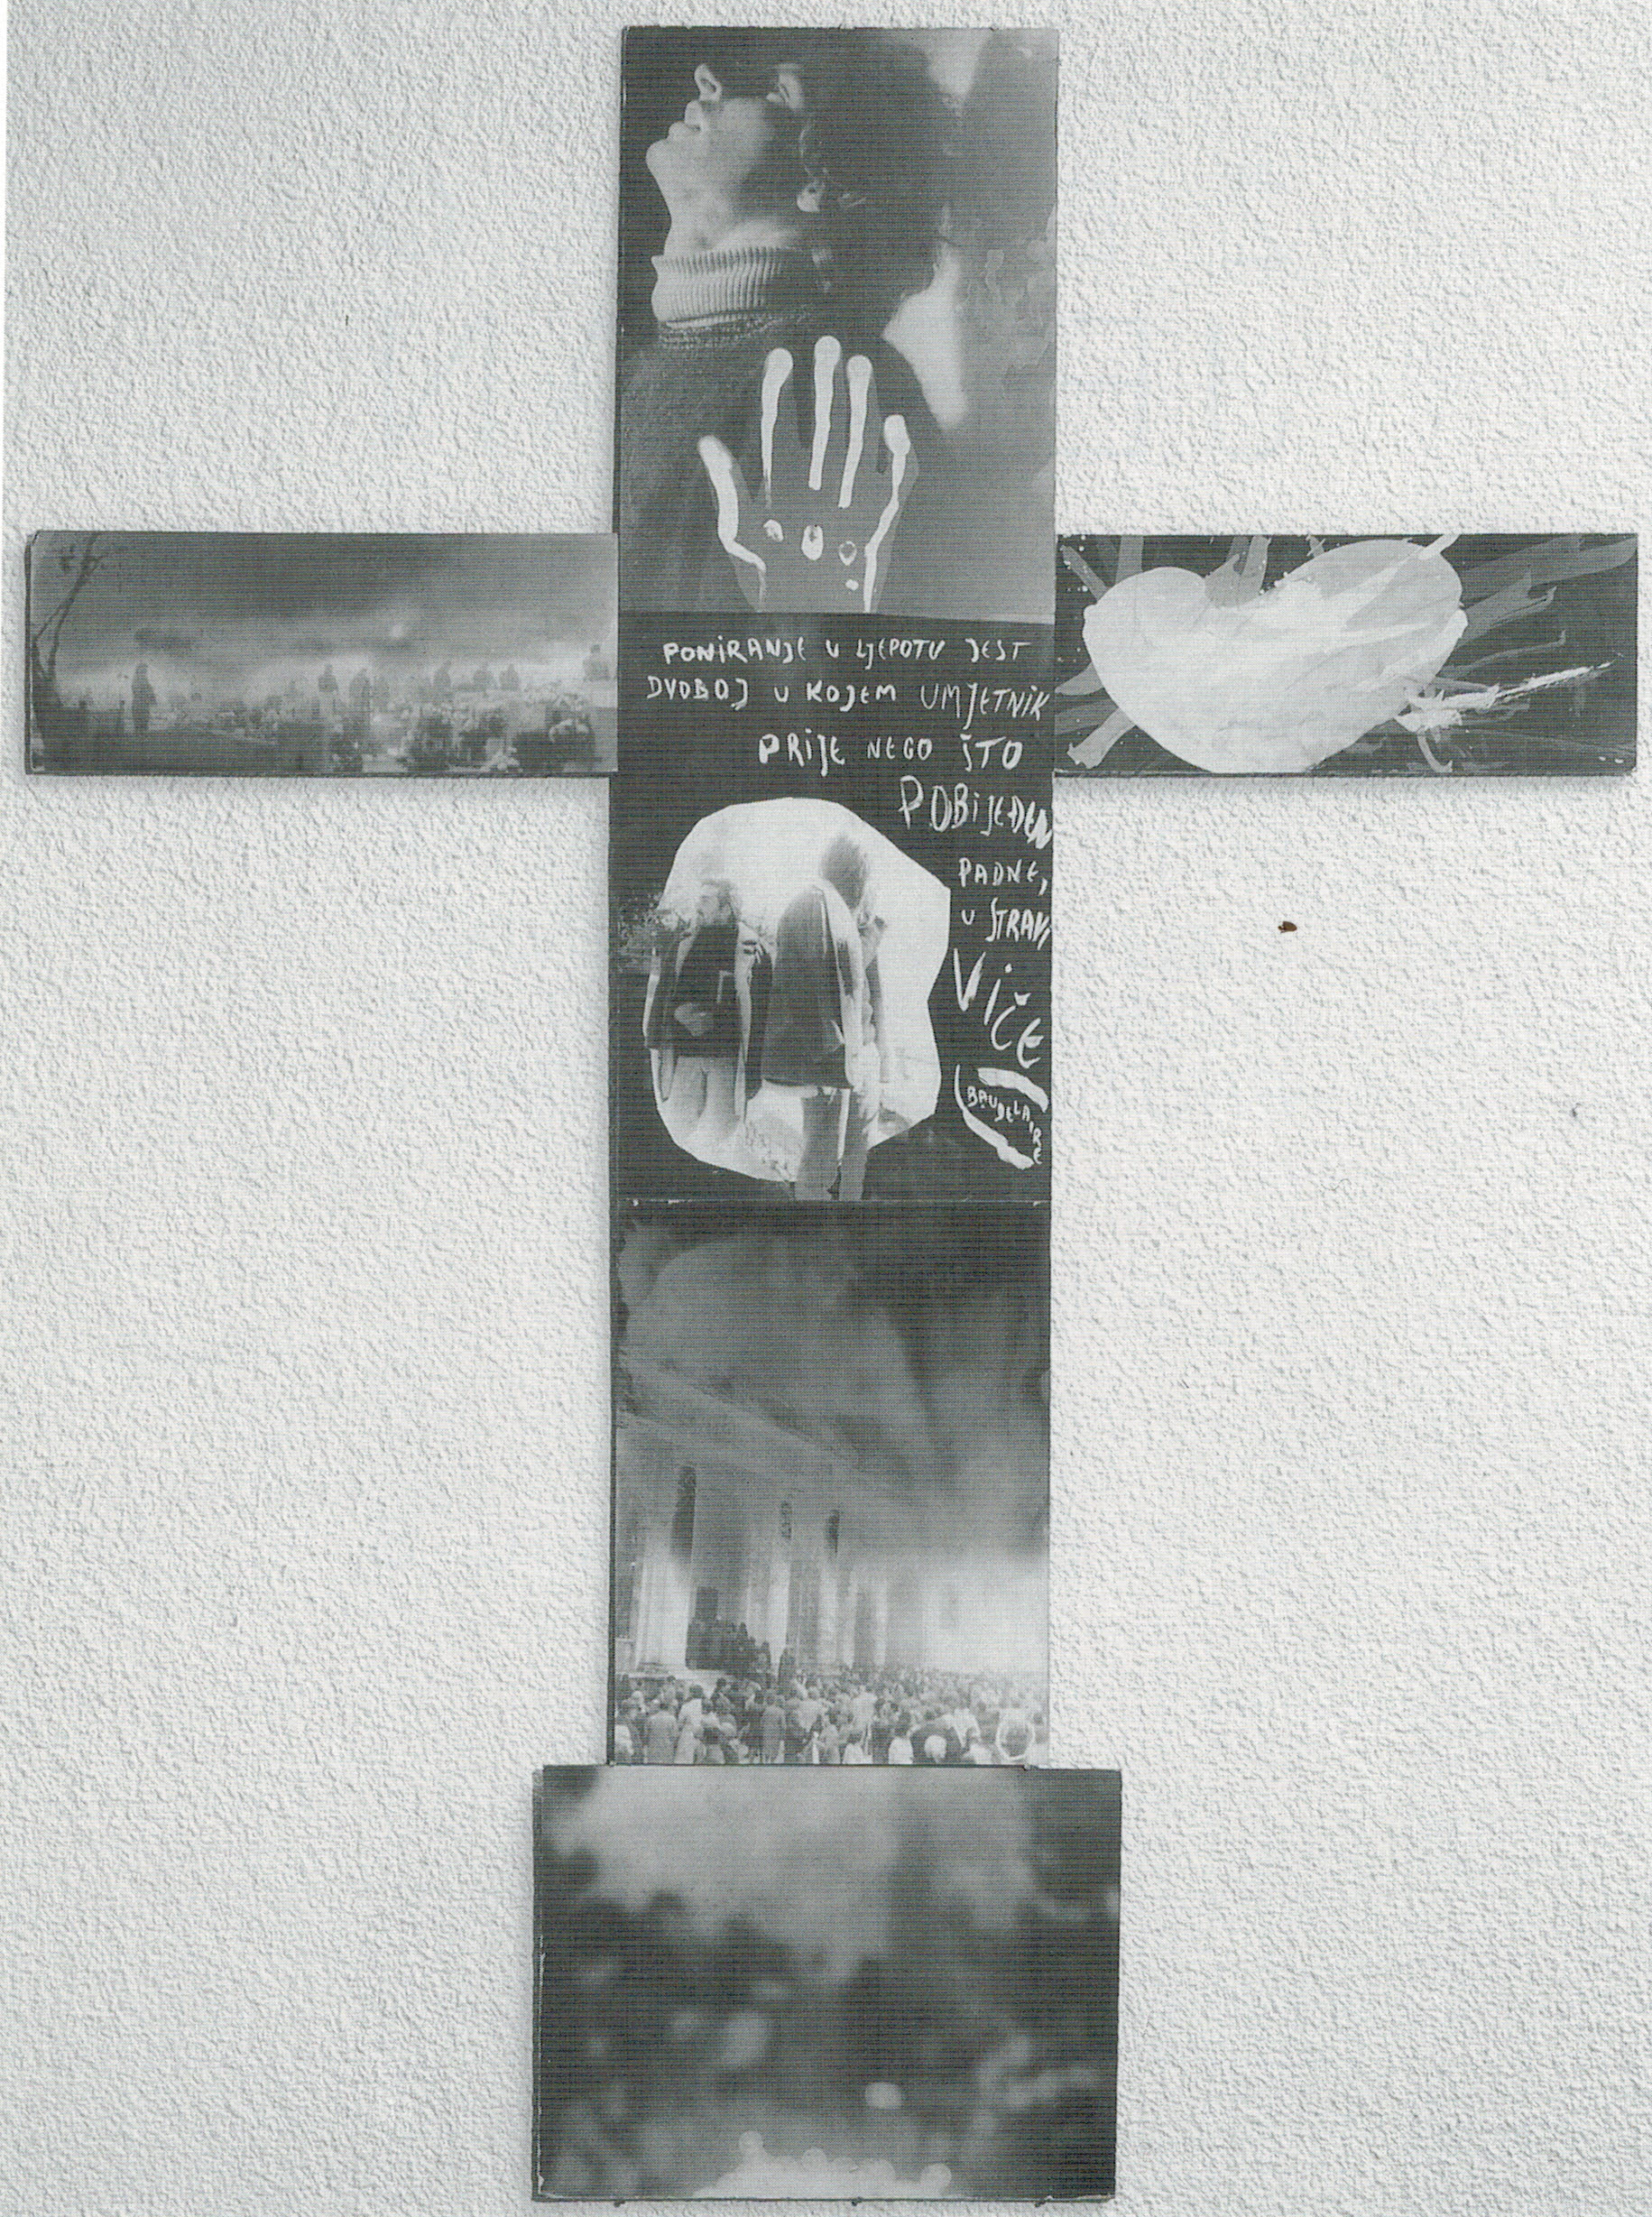 CROSS (1973) black and white photographs on hardboard, pencil